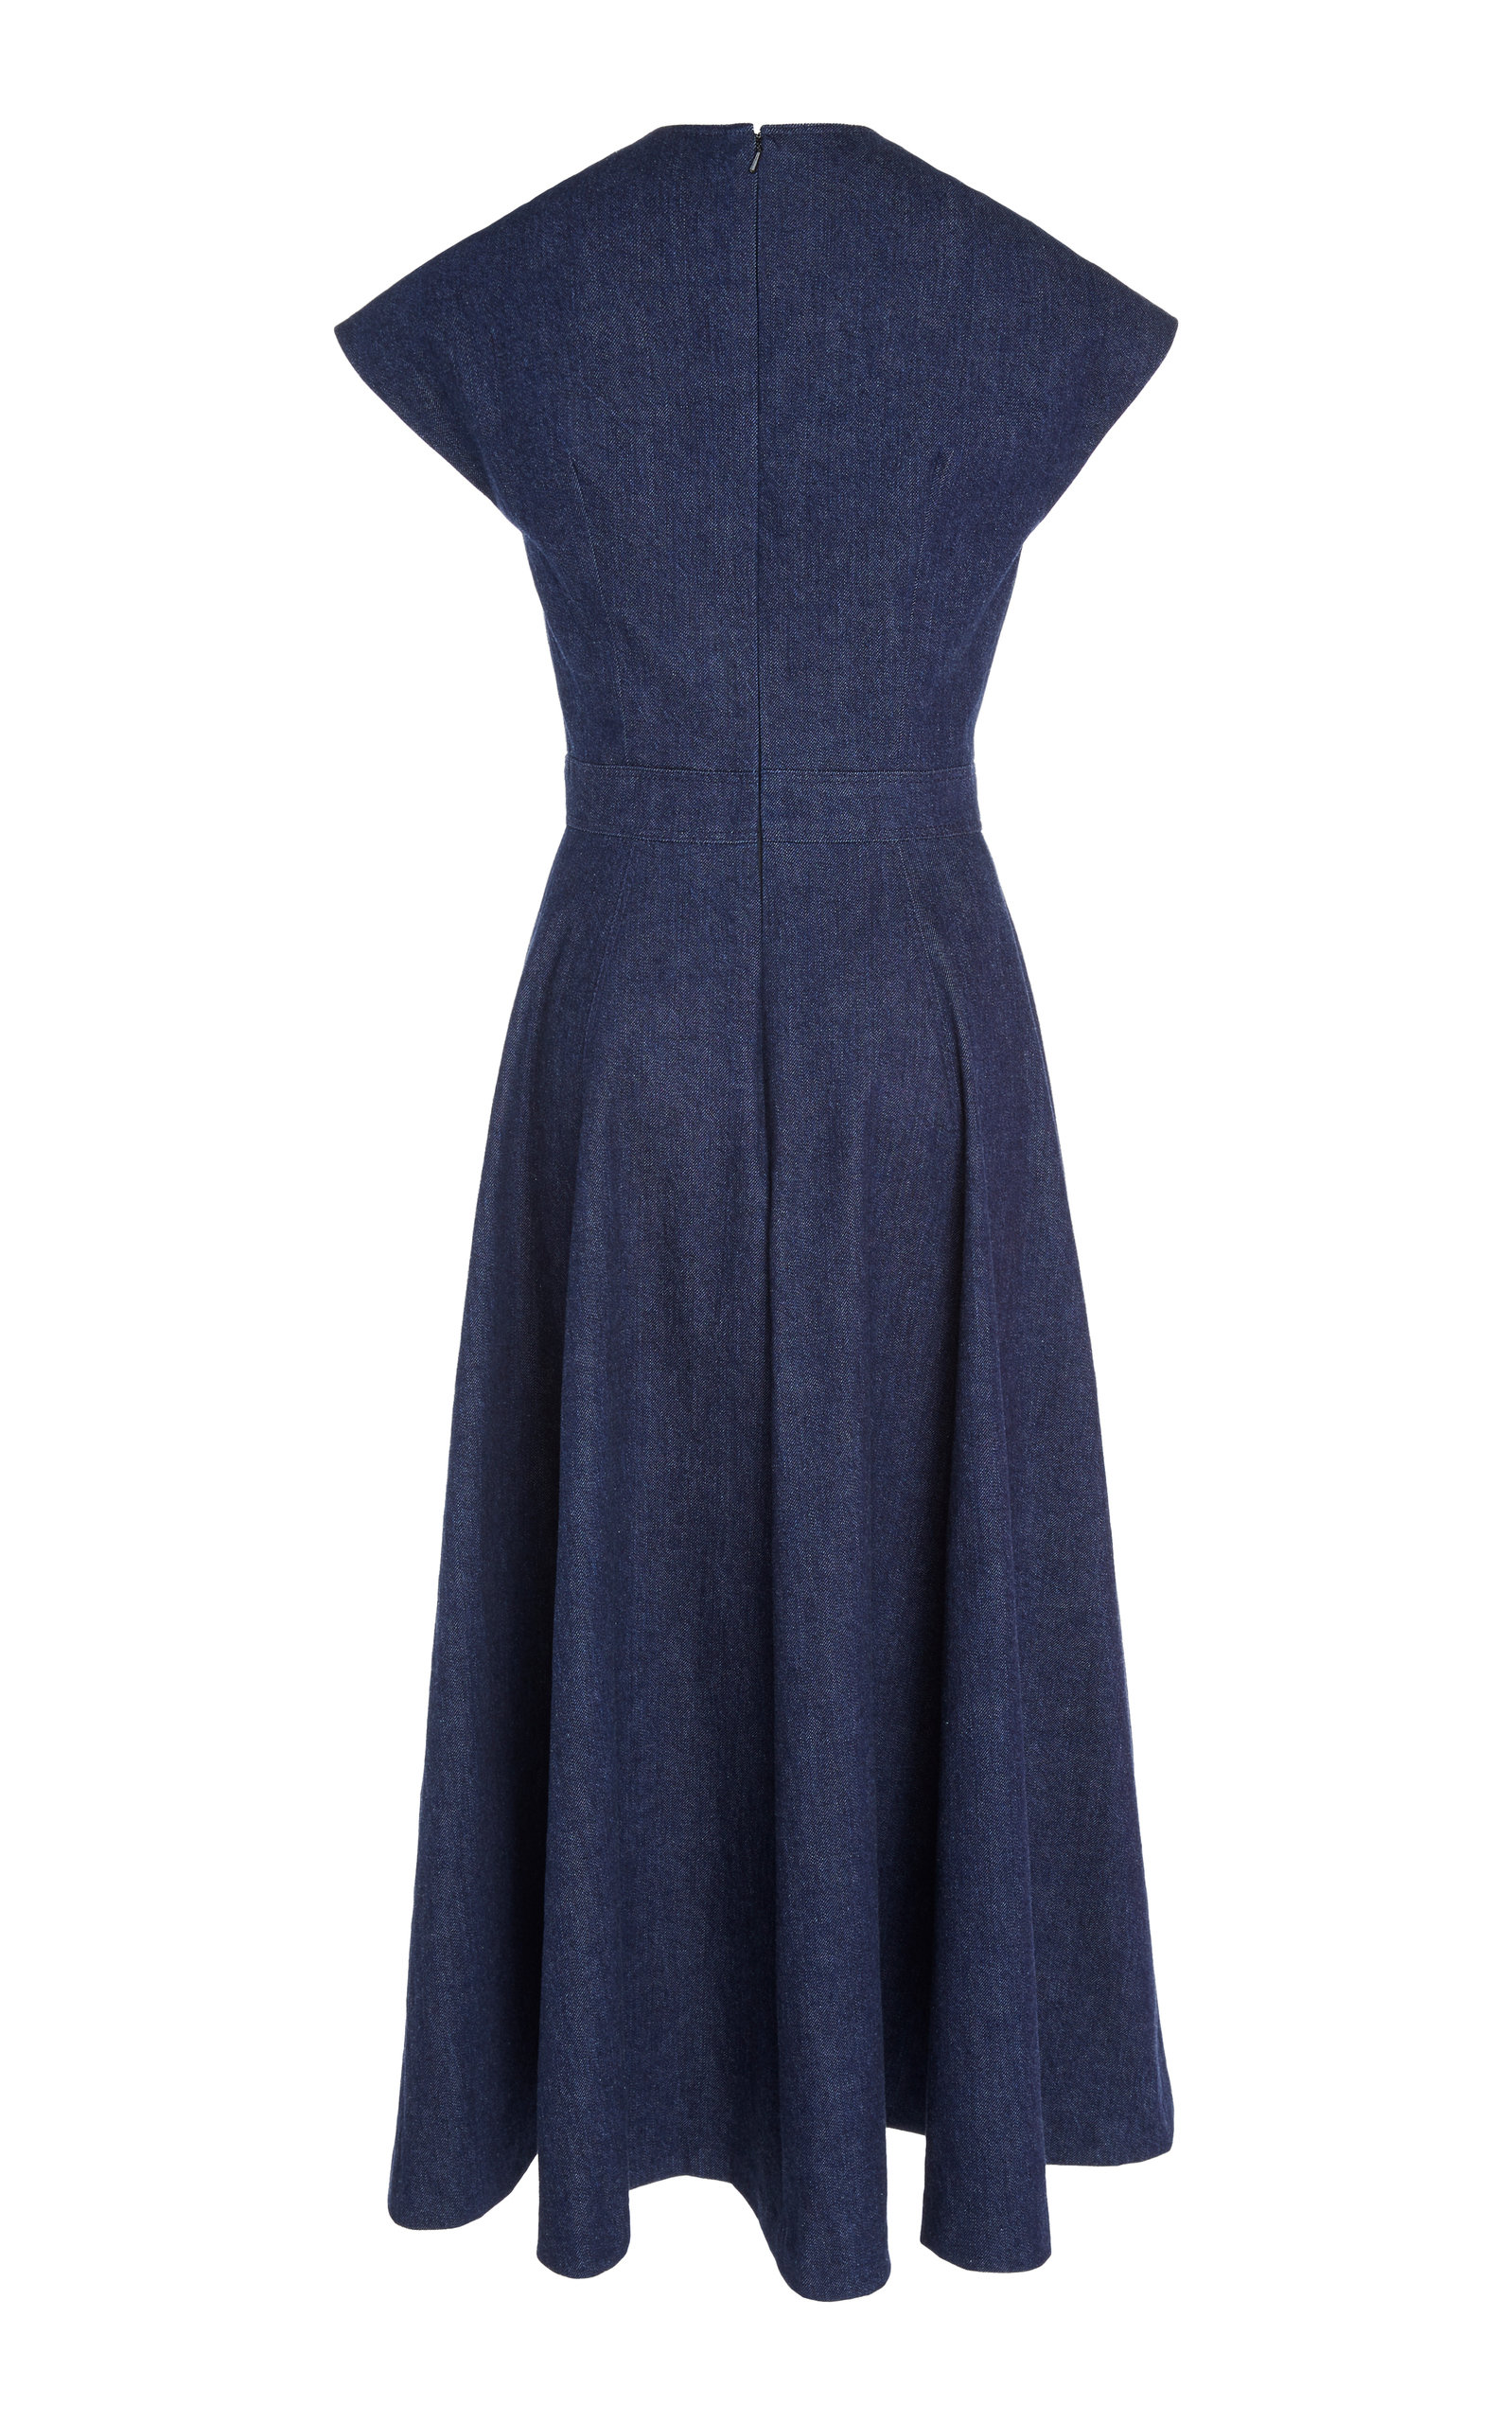 4d84d2da1f8 V-Neck Faux Wrap Midi Dress by Carolina Herrera